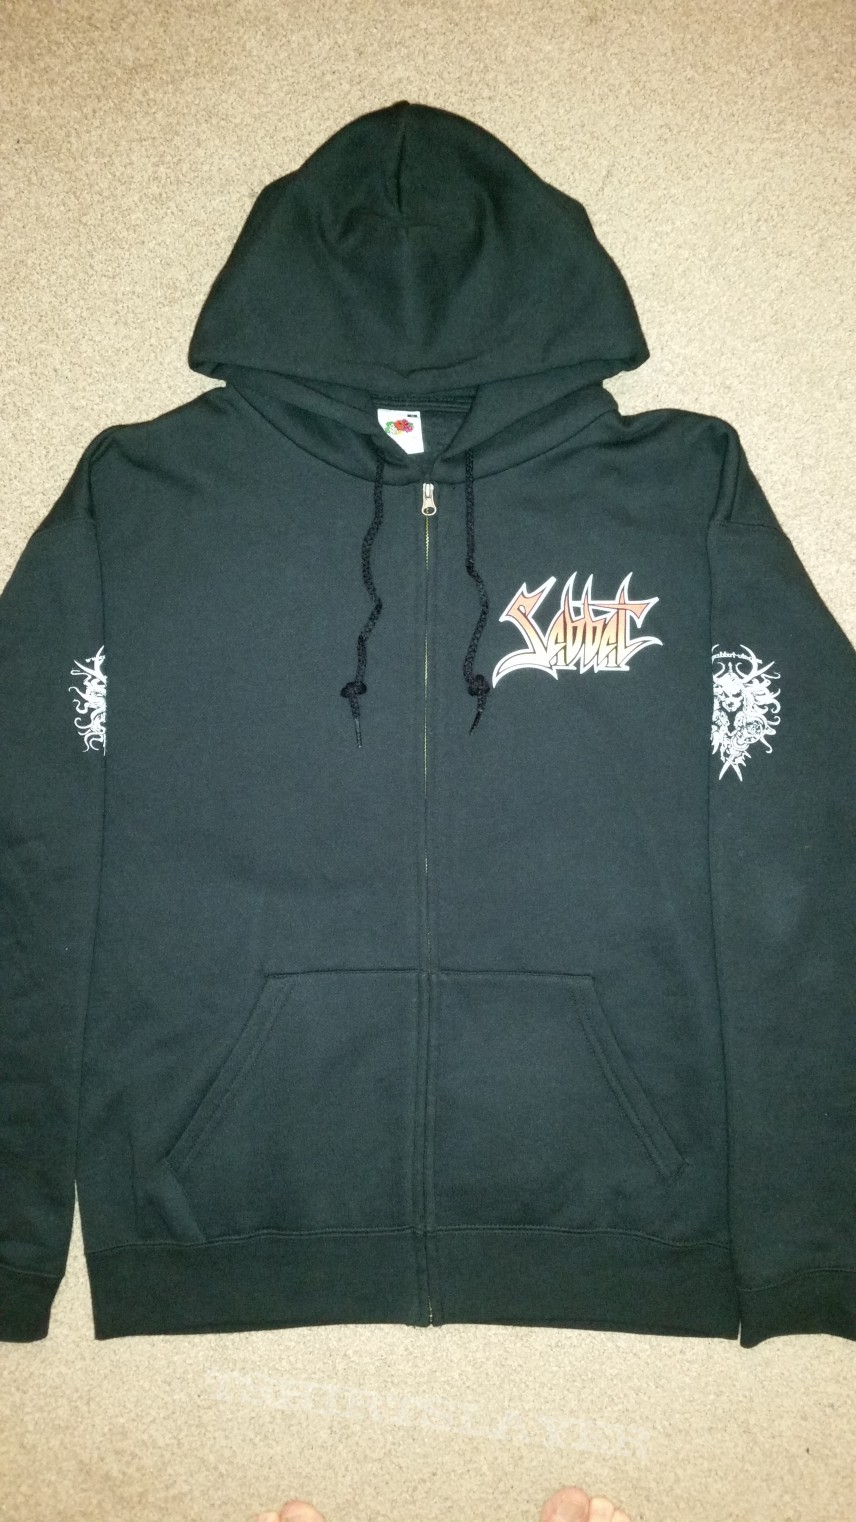 Sabbat - dream weaver hoodie